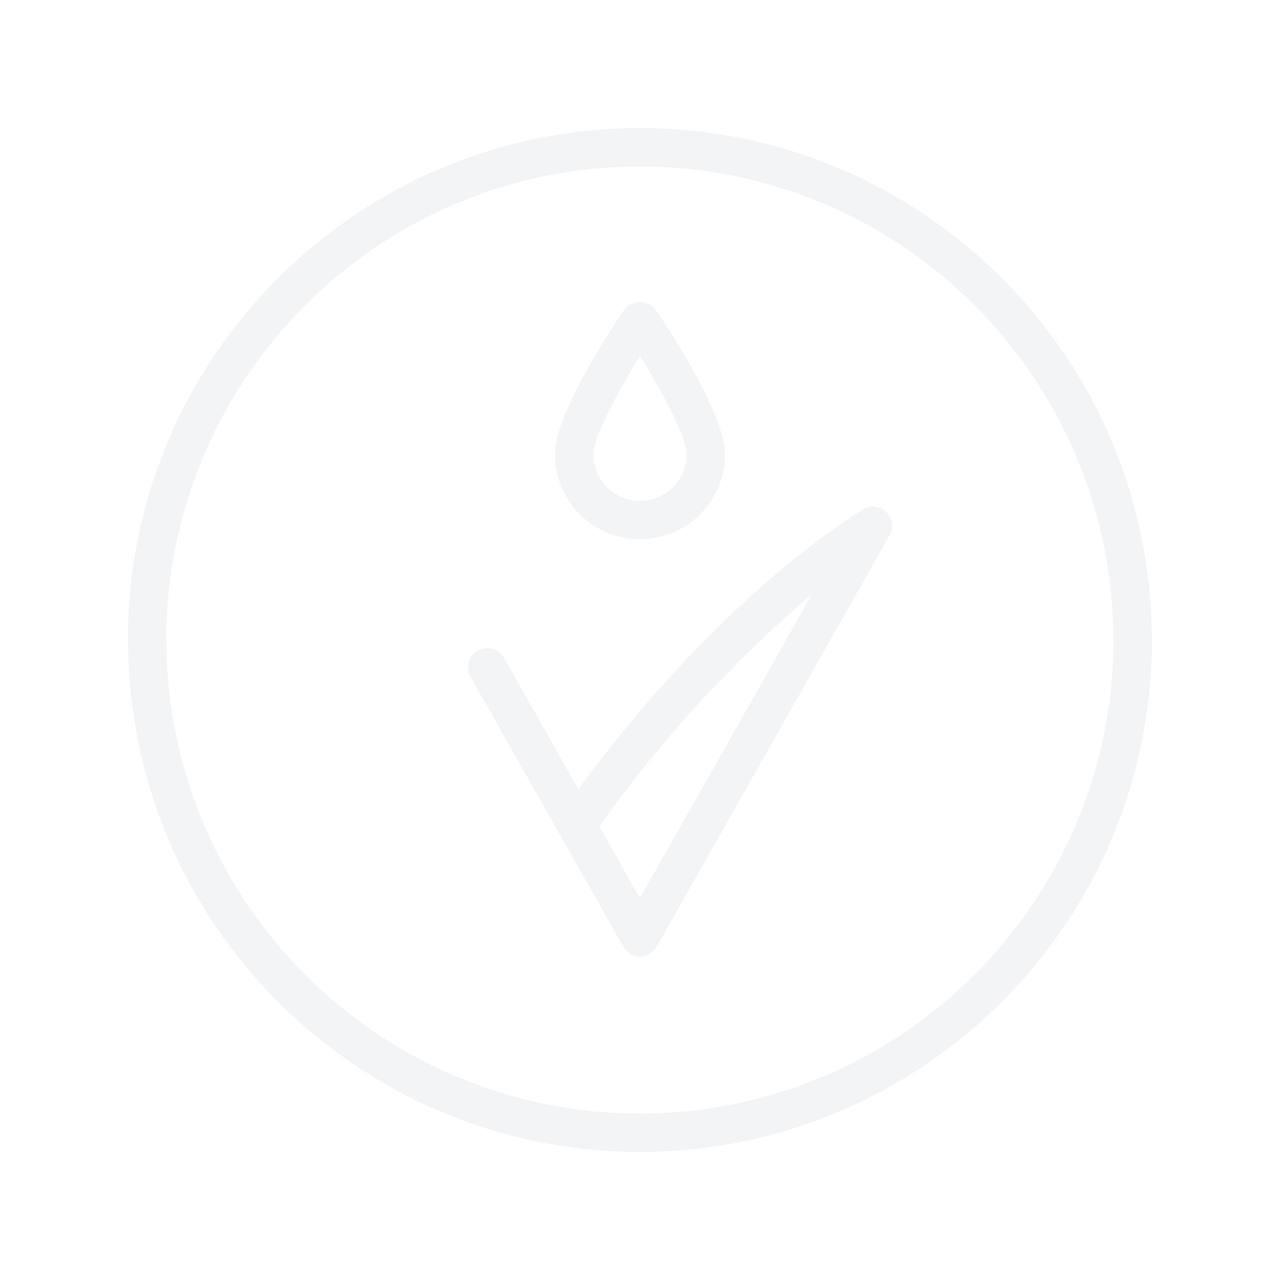 MAYBELLINE Color Sensational Loaded Bolds Lipstick No.887 Blackest Berry 3.9g